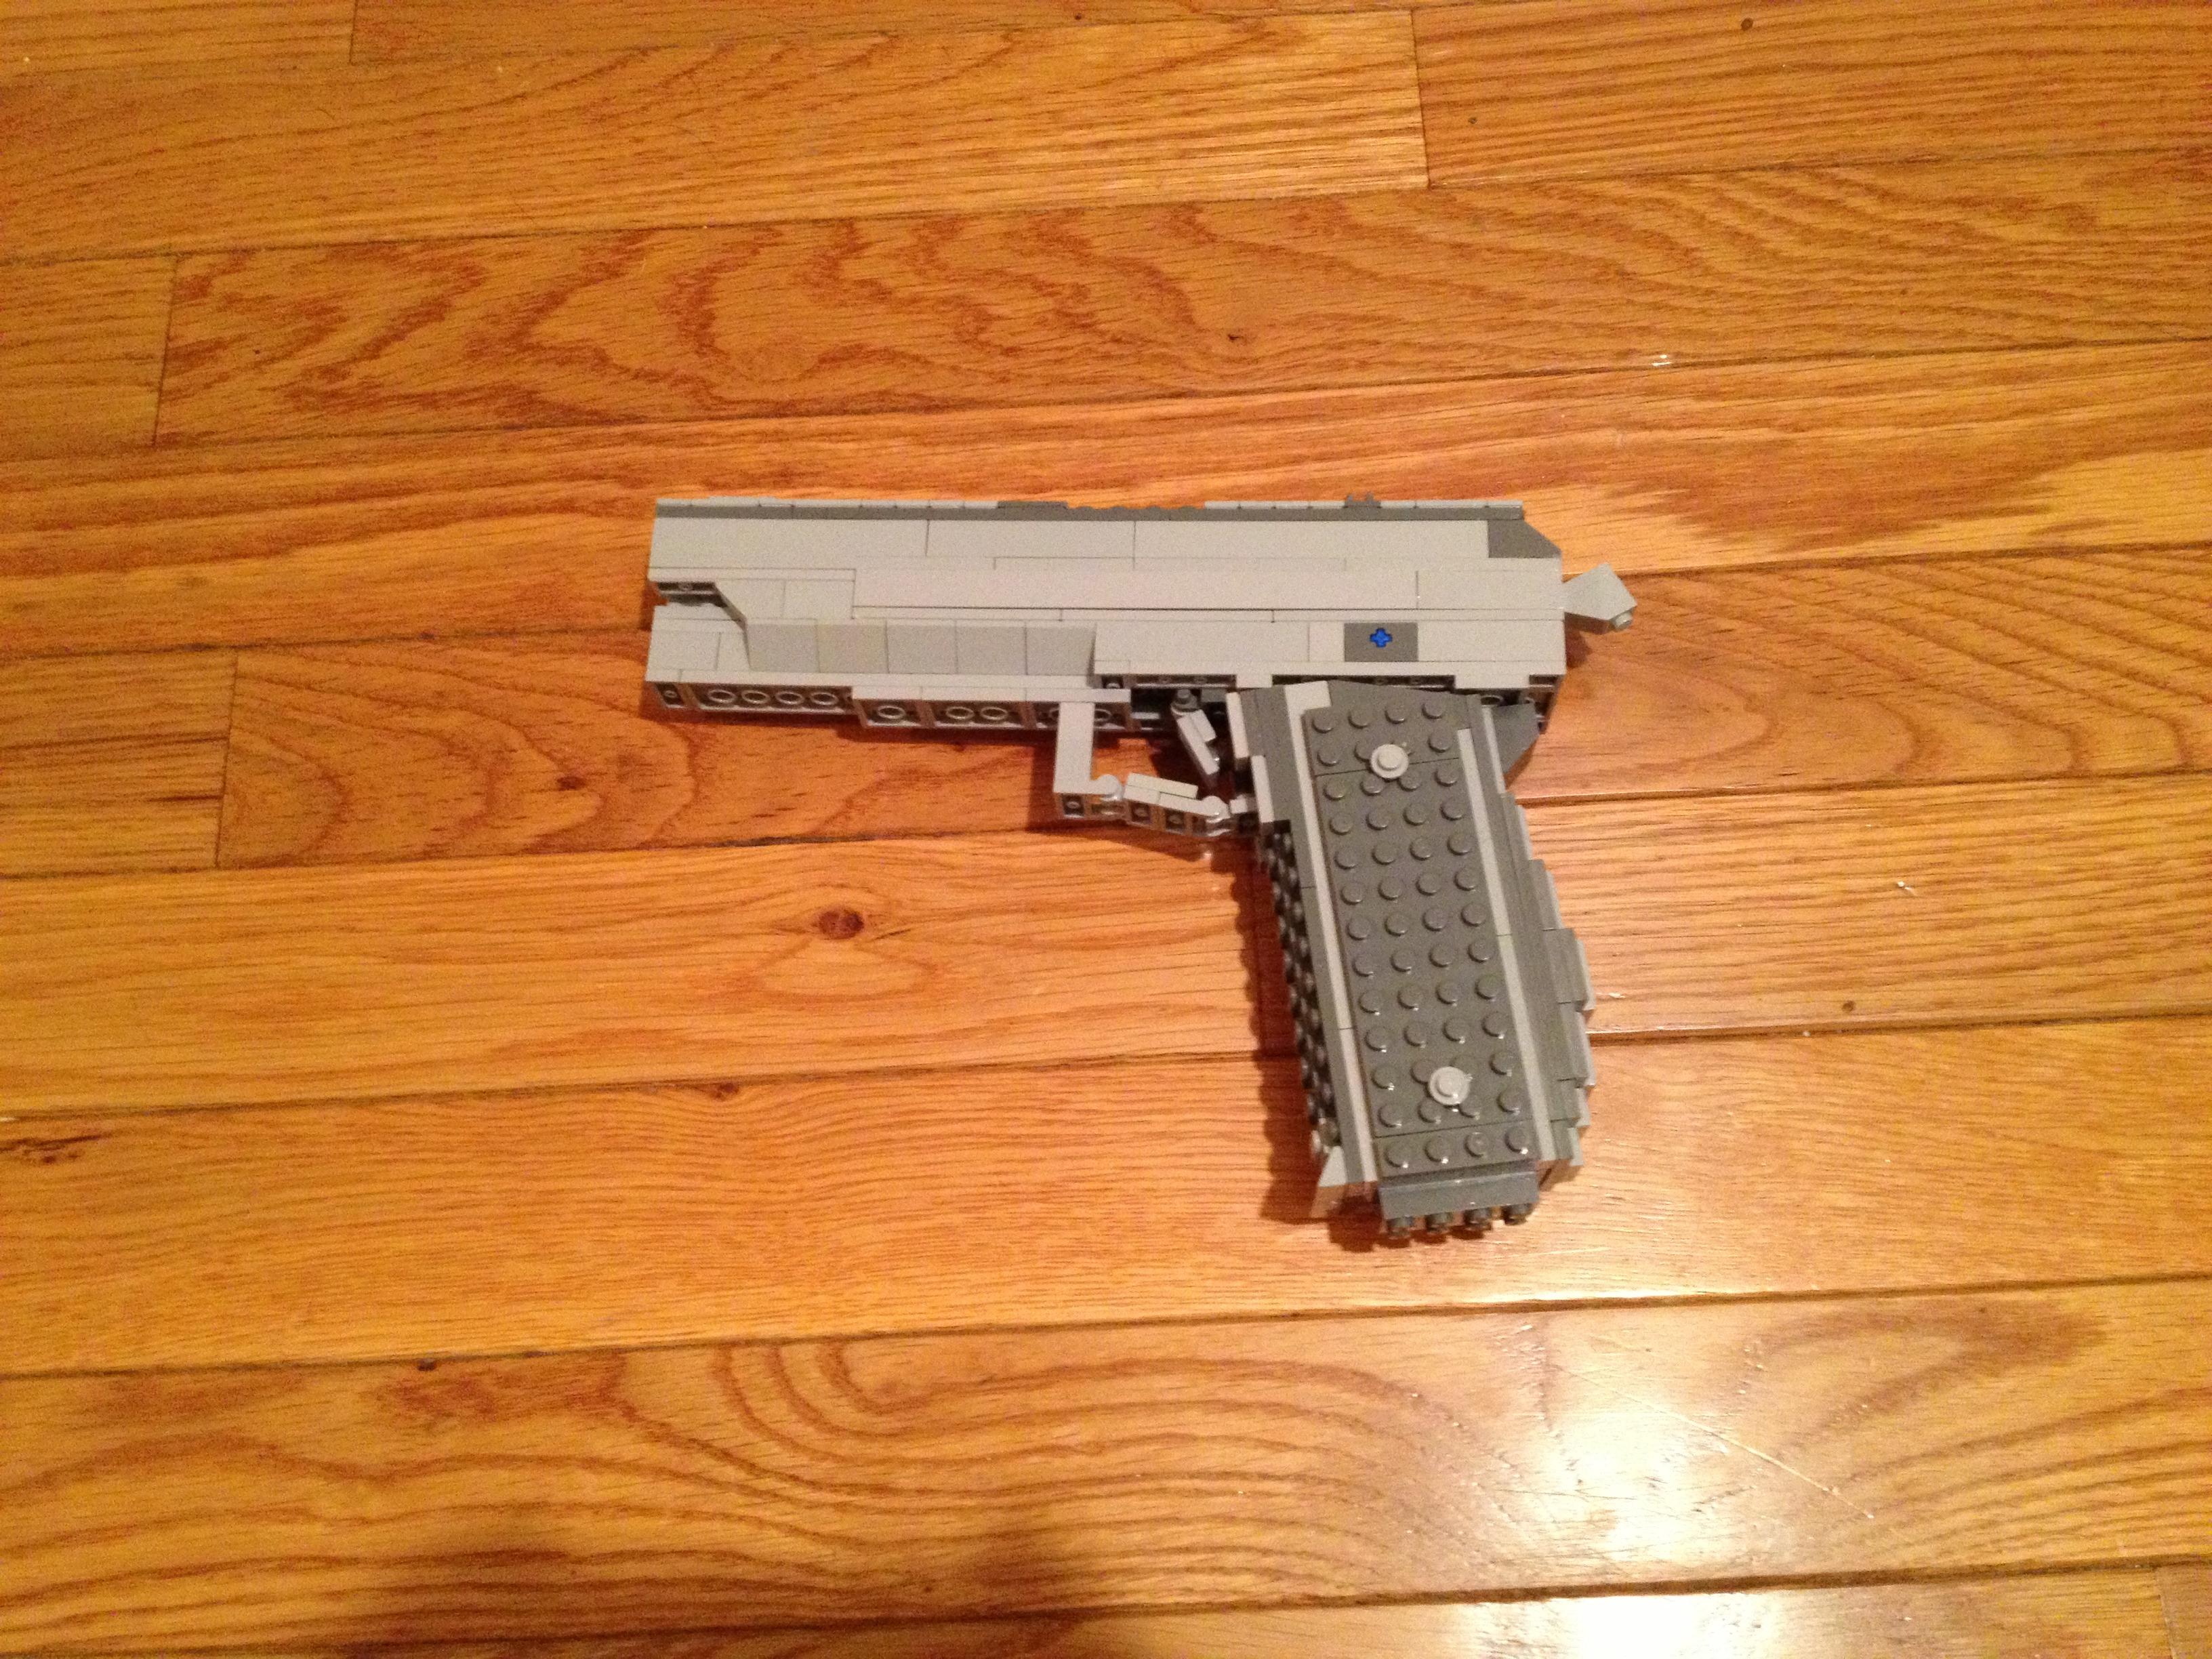 Lego SIG Sauer P226